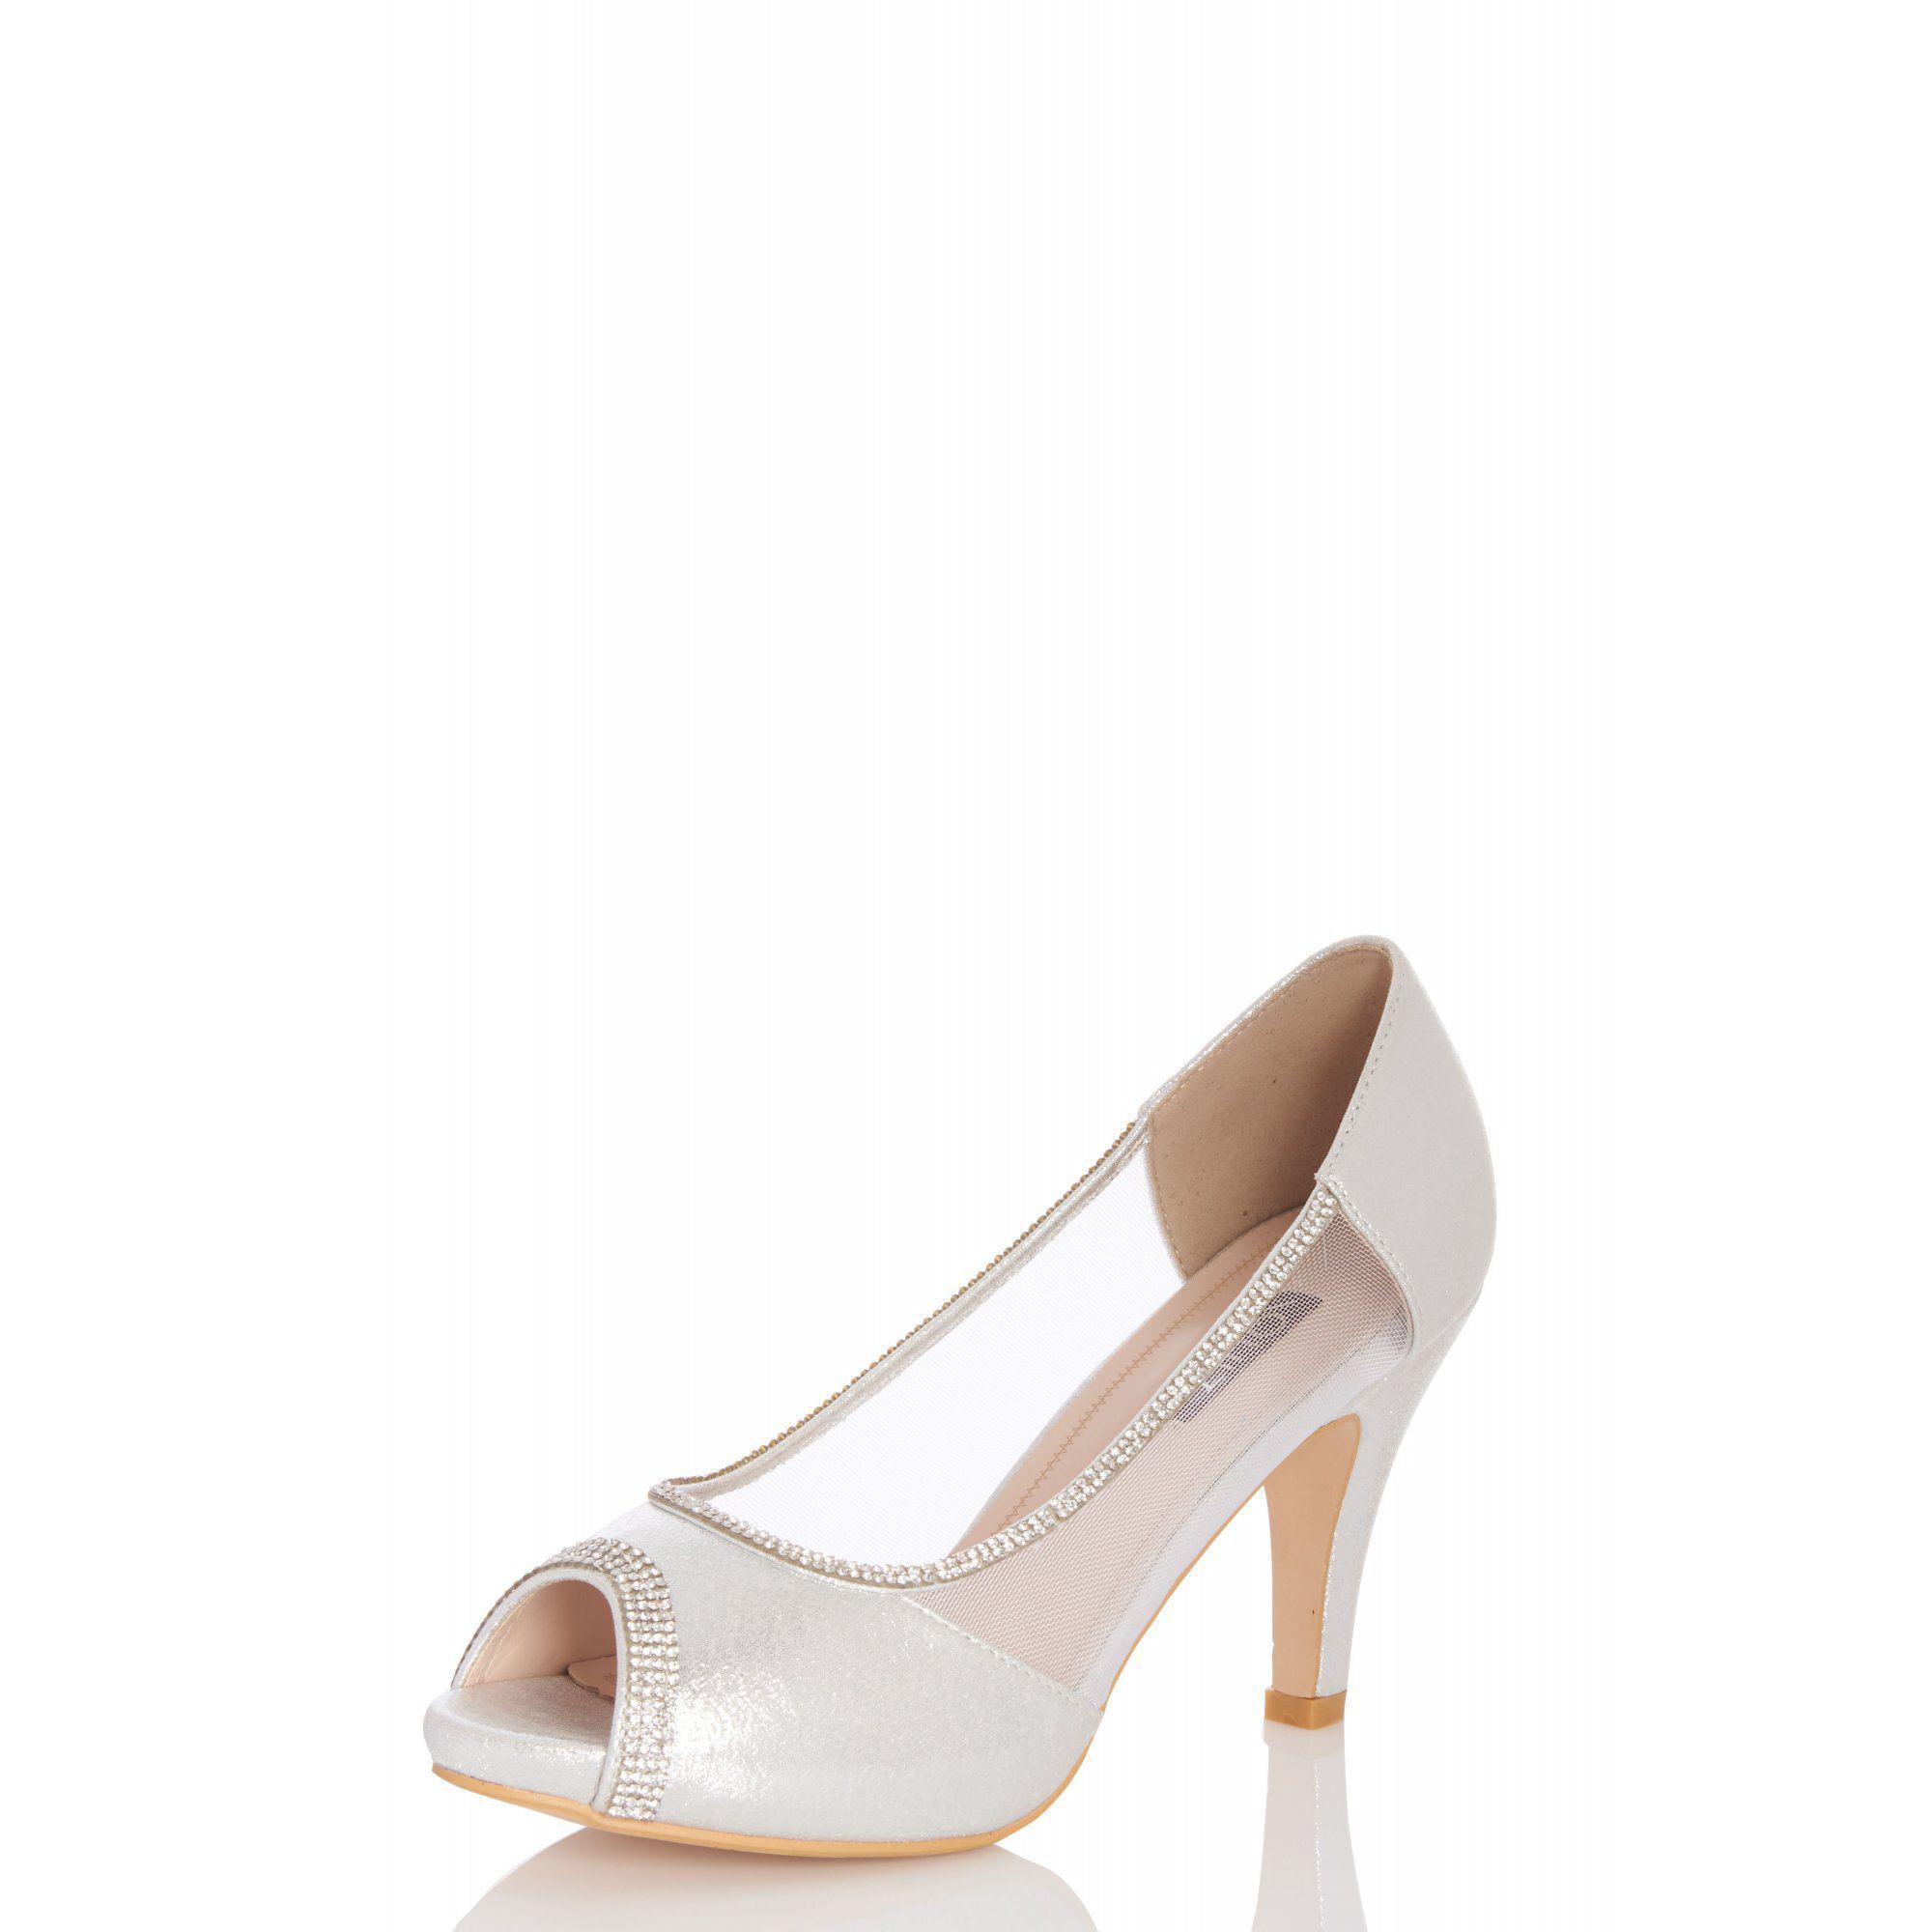 0cd96d85ab9 Quiz - Metallic Silver Shimmer Peep Toe Low Heel Shoes - Lyst. View  fullscreen